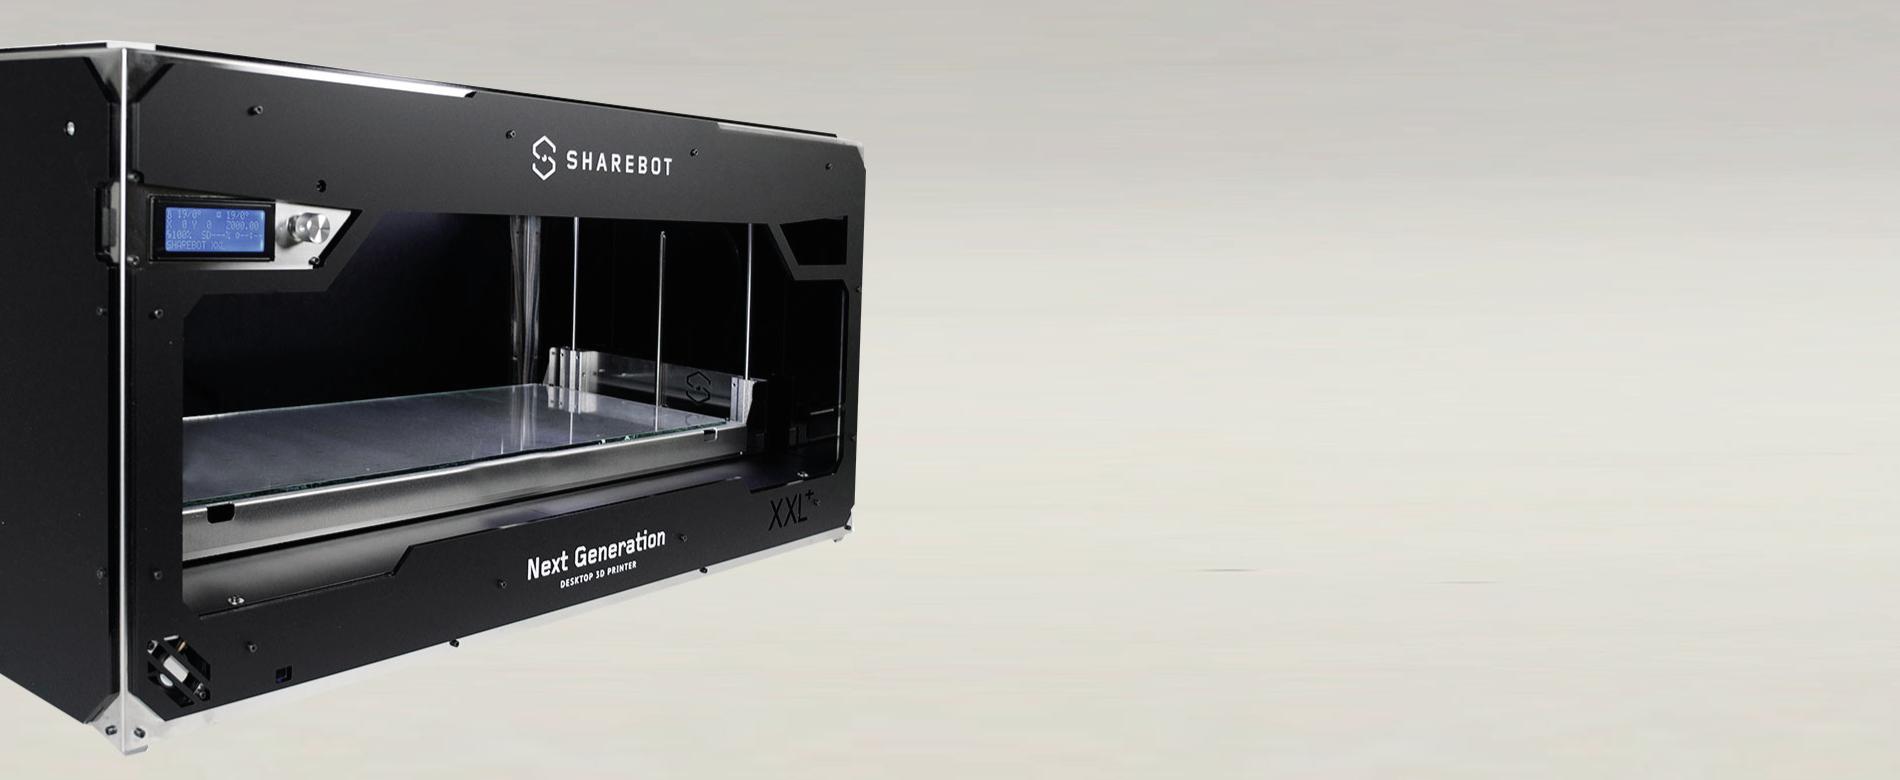 Stampanti 3D Sharebot Monza stampanti 3D professionali 3d store 3d shop xxl